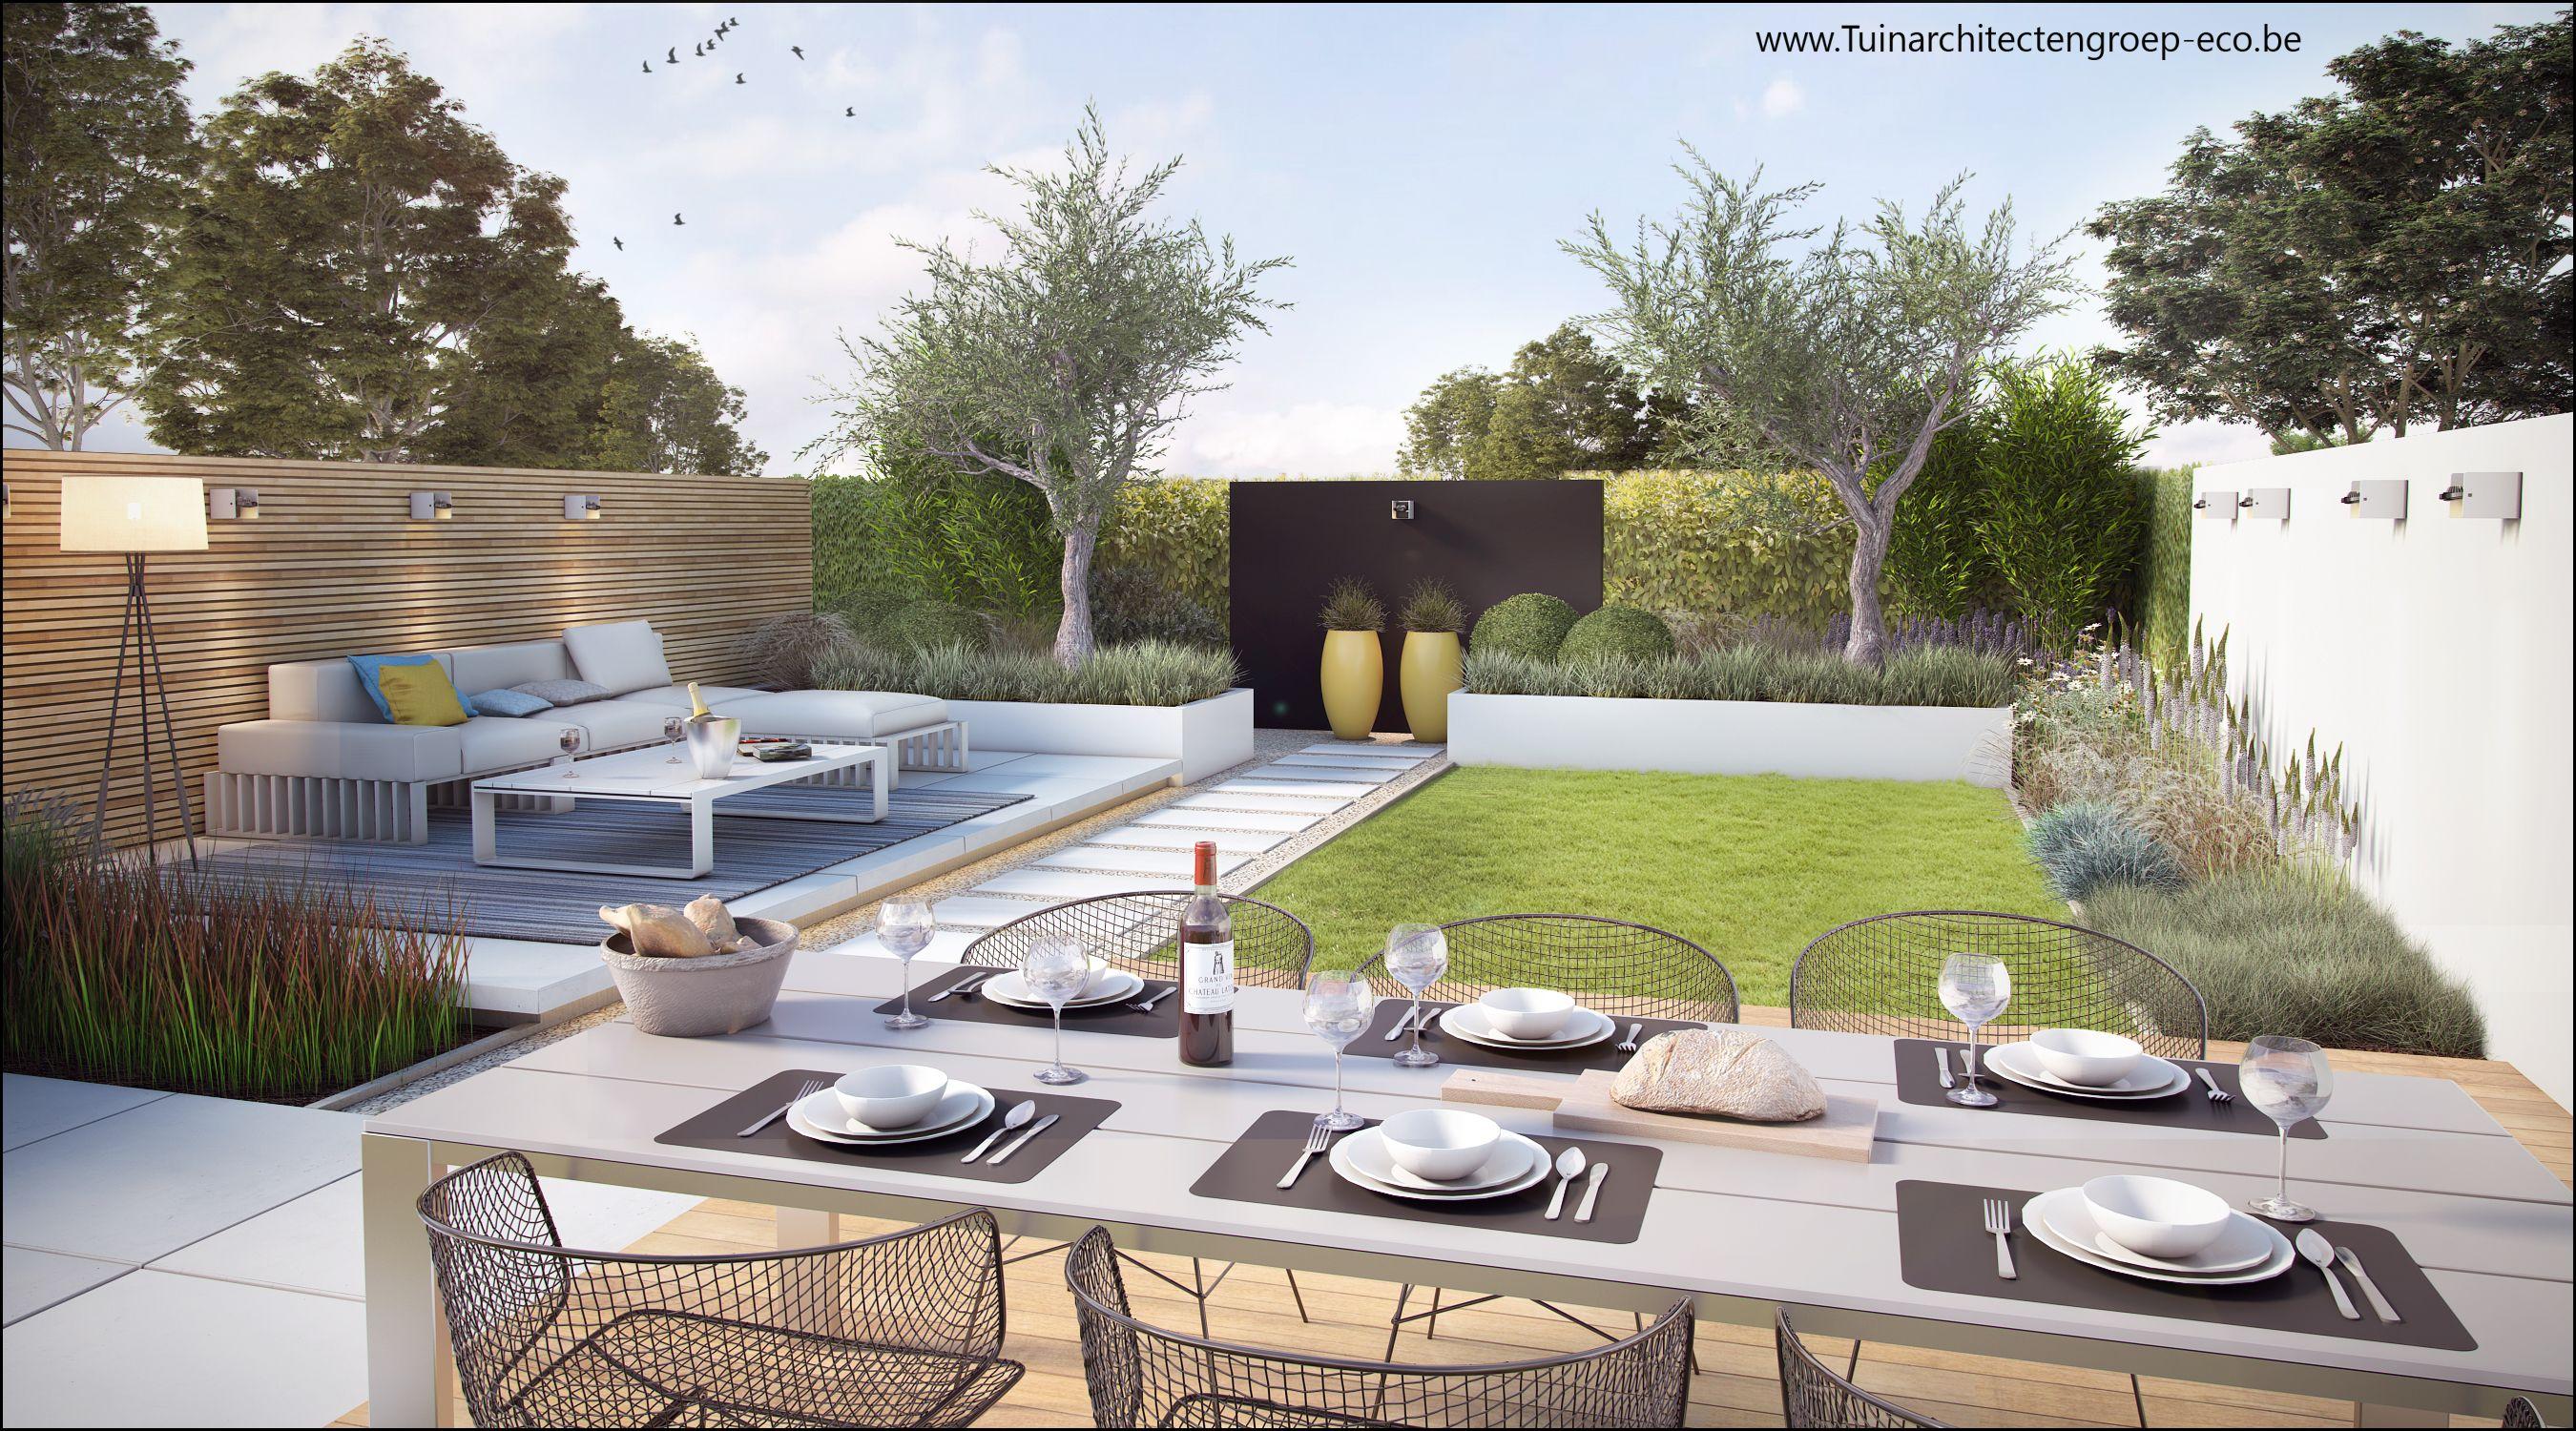 tuinarchitect timothy cools tuinarchitectengroep eco poolhouse